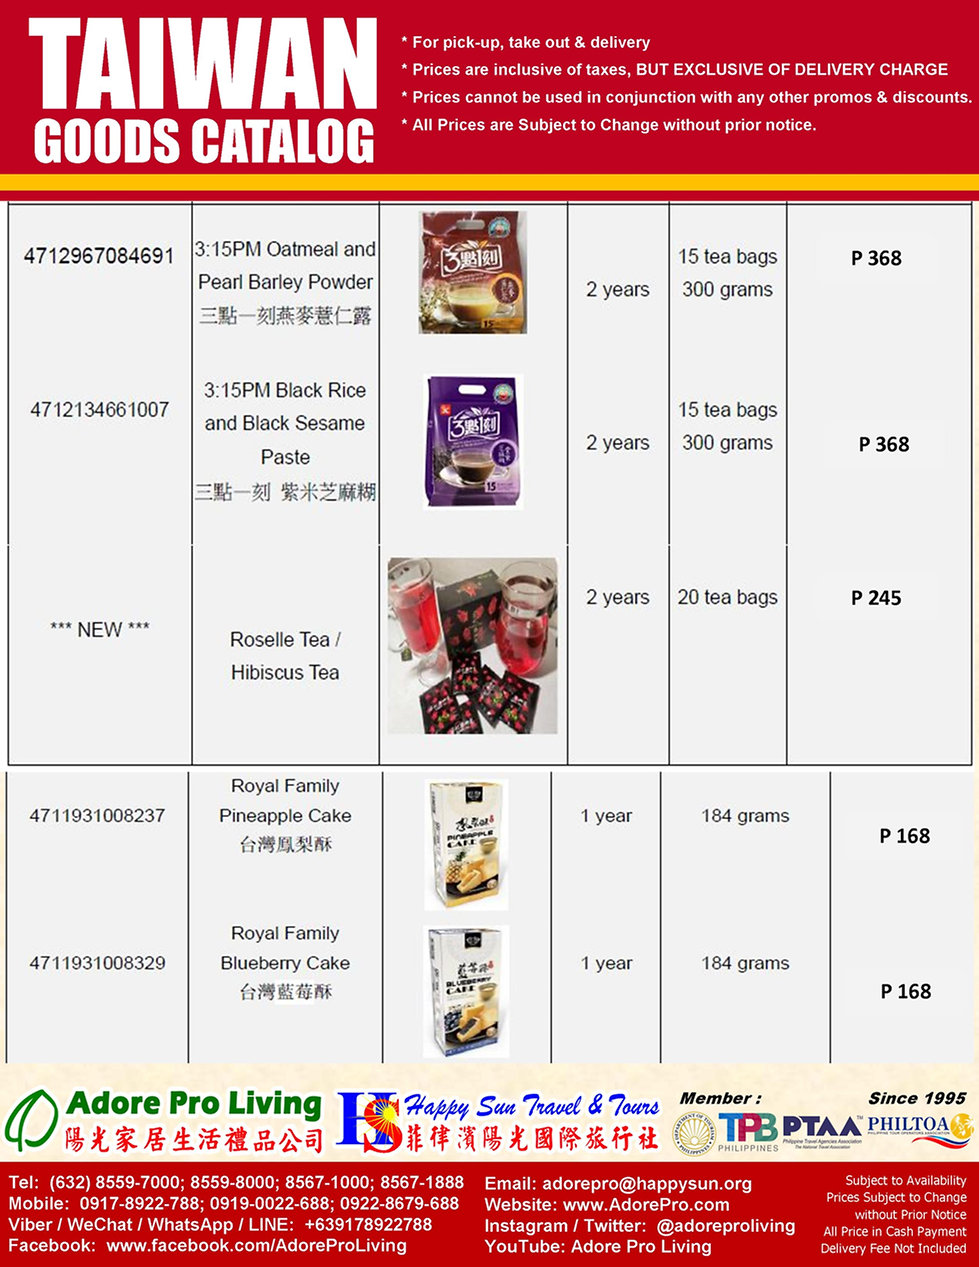 P19_Taiwan Goods Catalog_202009119.jpg